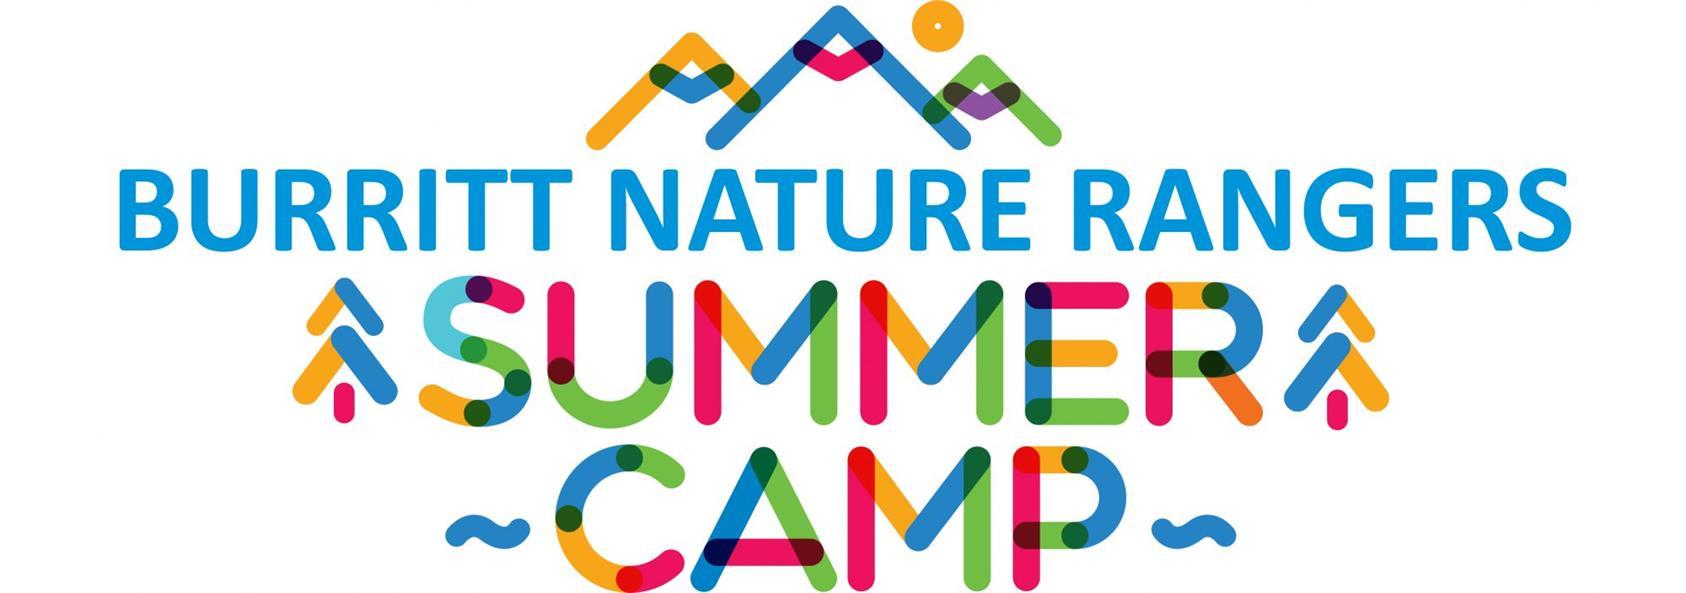 Nature Ranger Camps